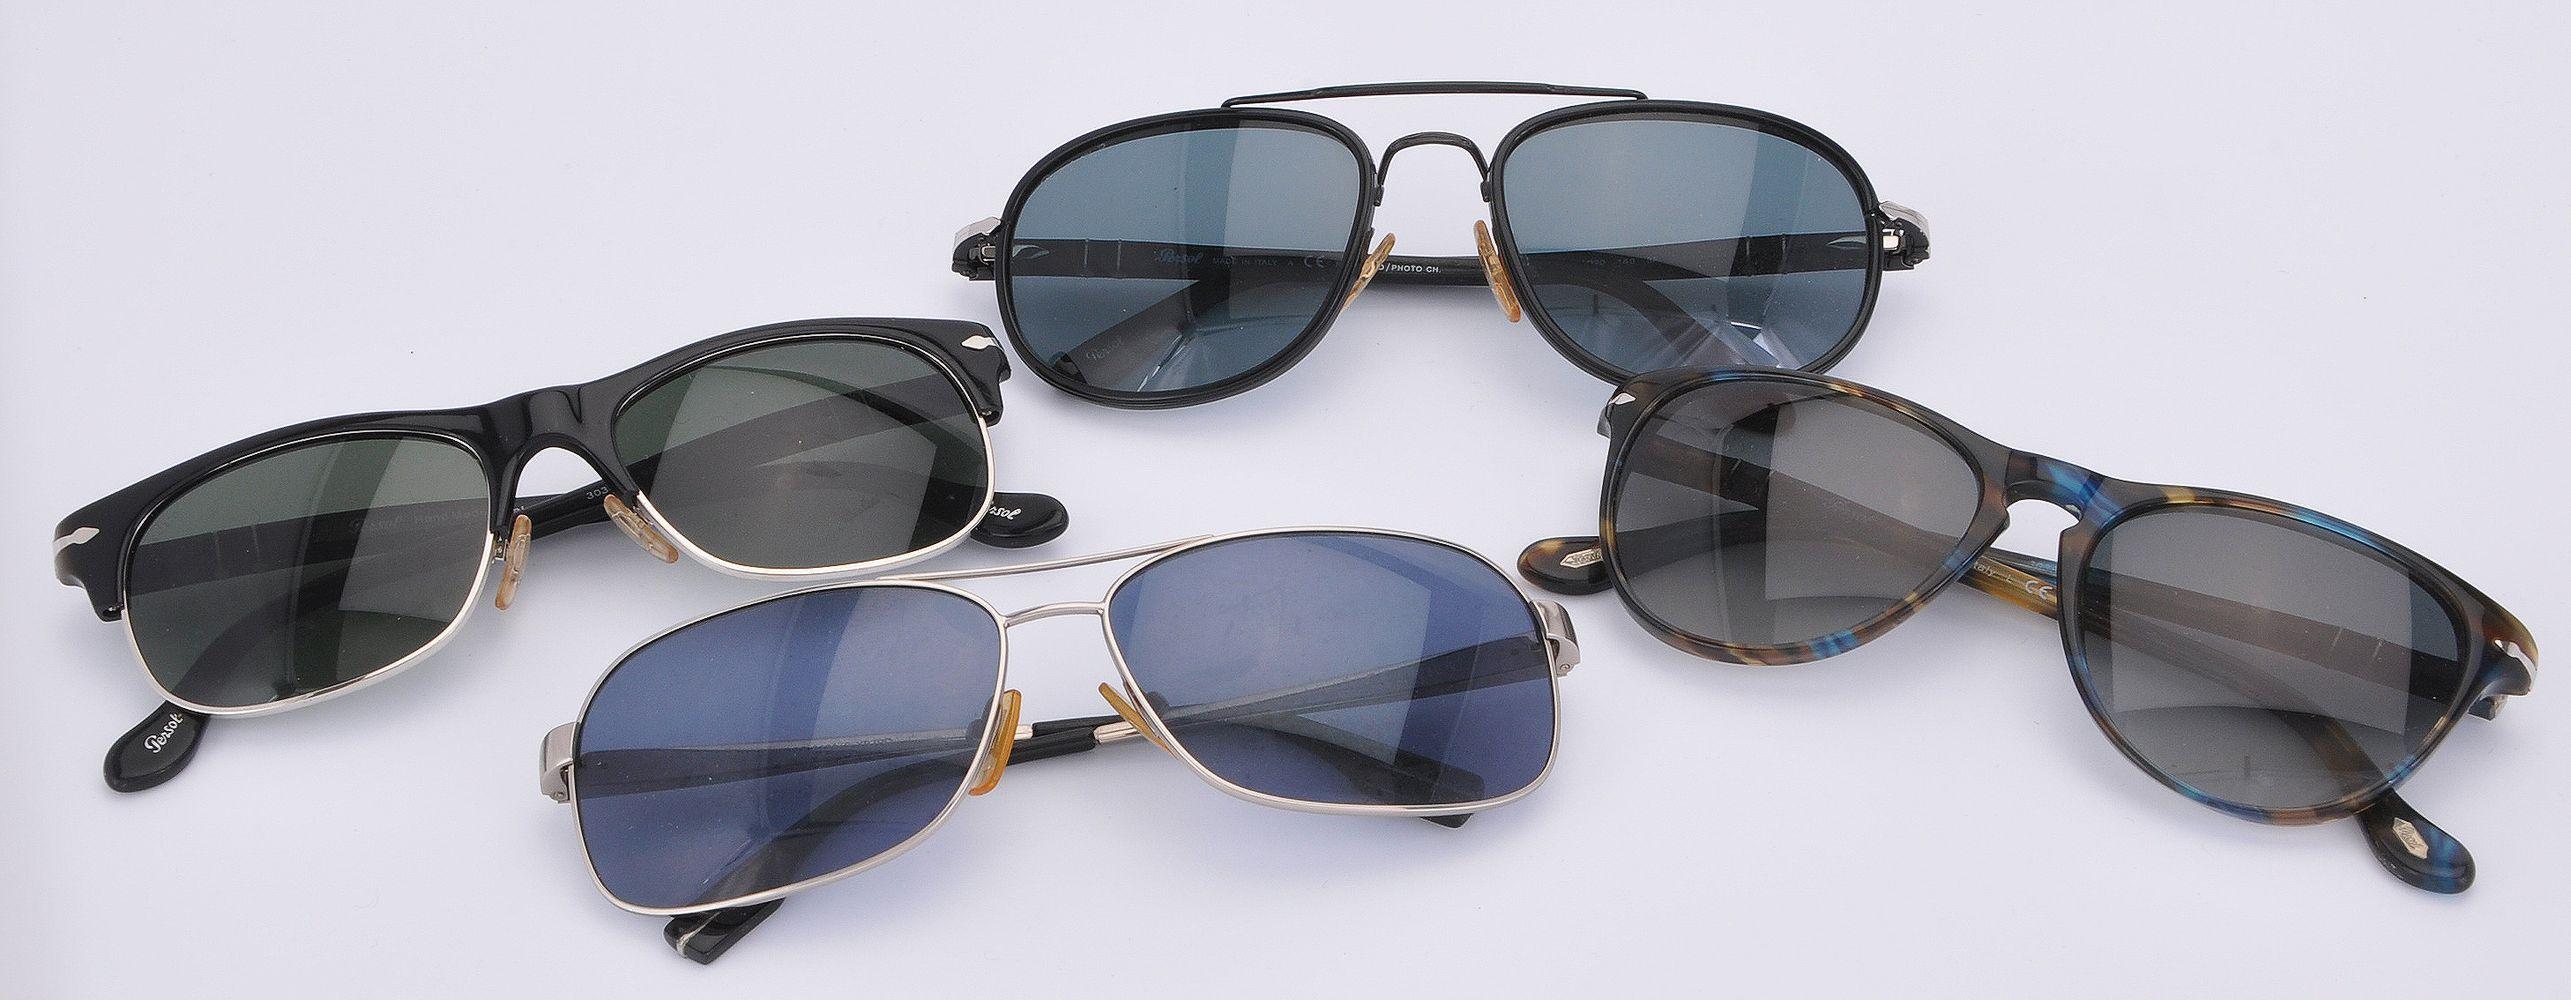 Lot 1100 - Persol, three pairs of sunglasses